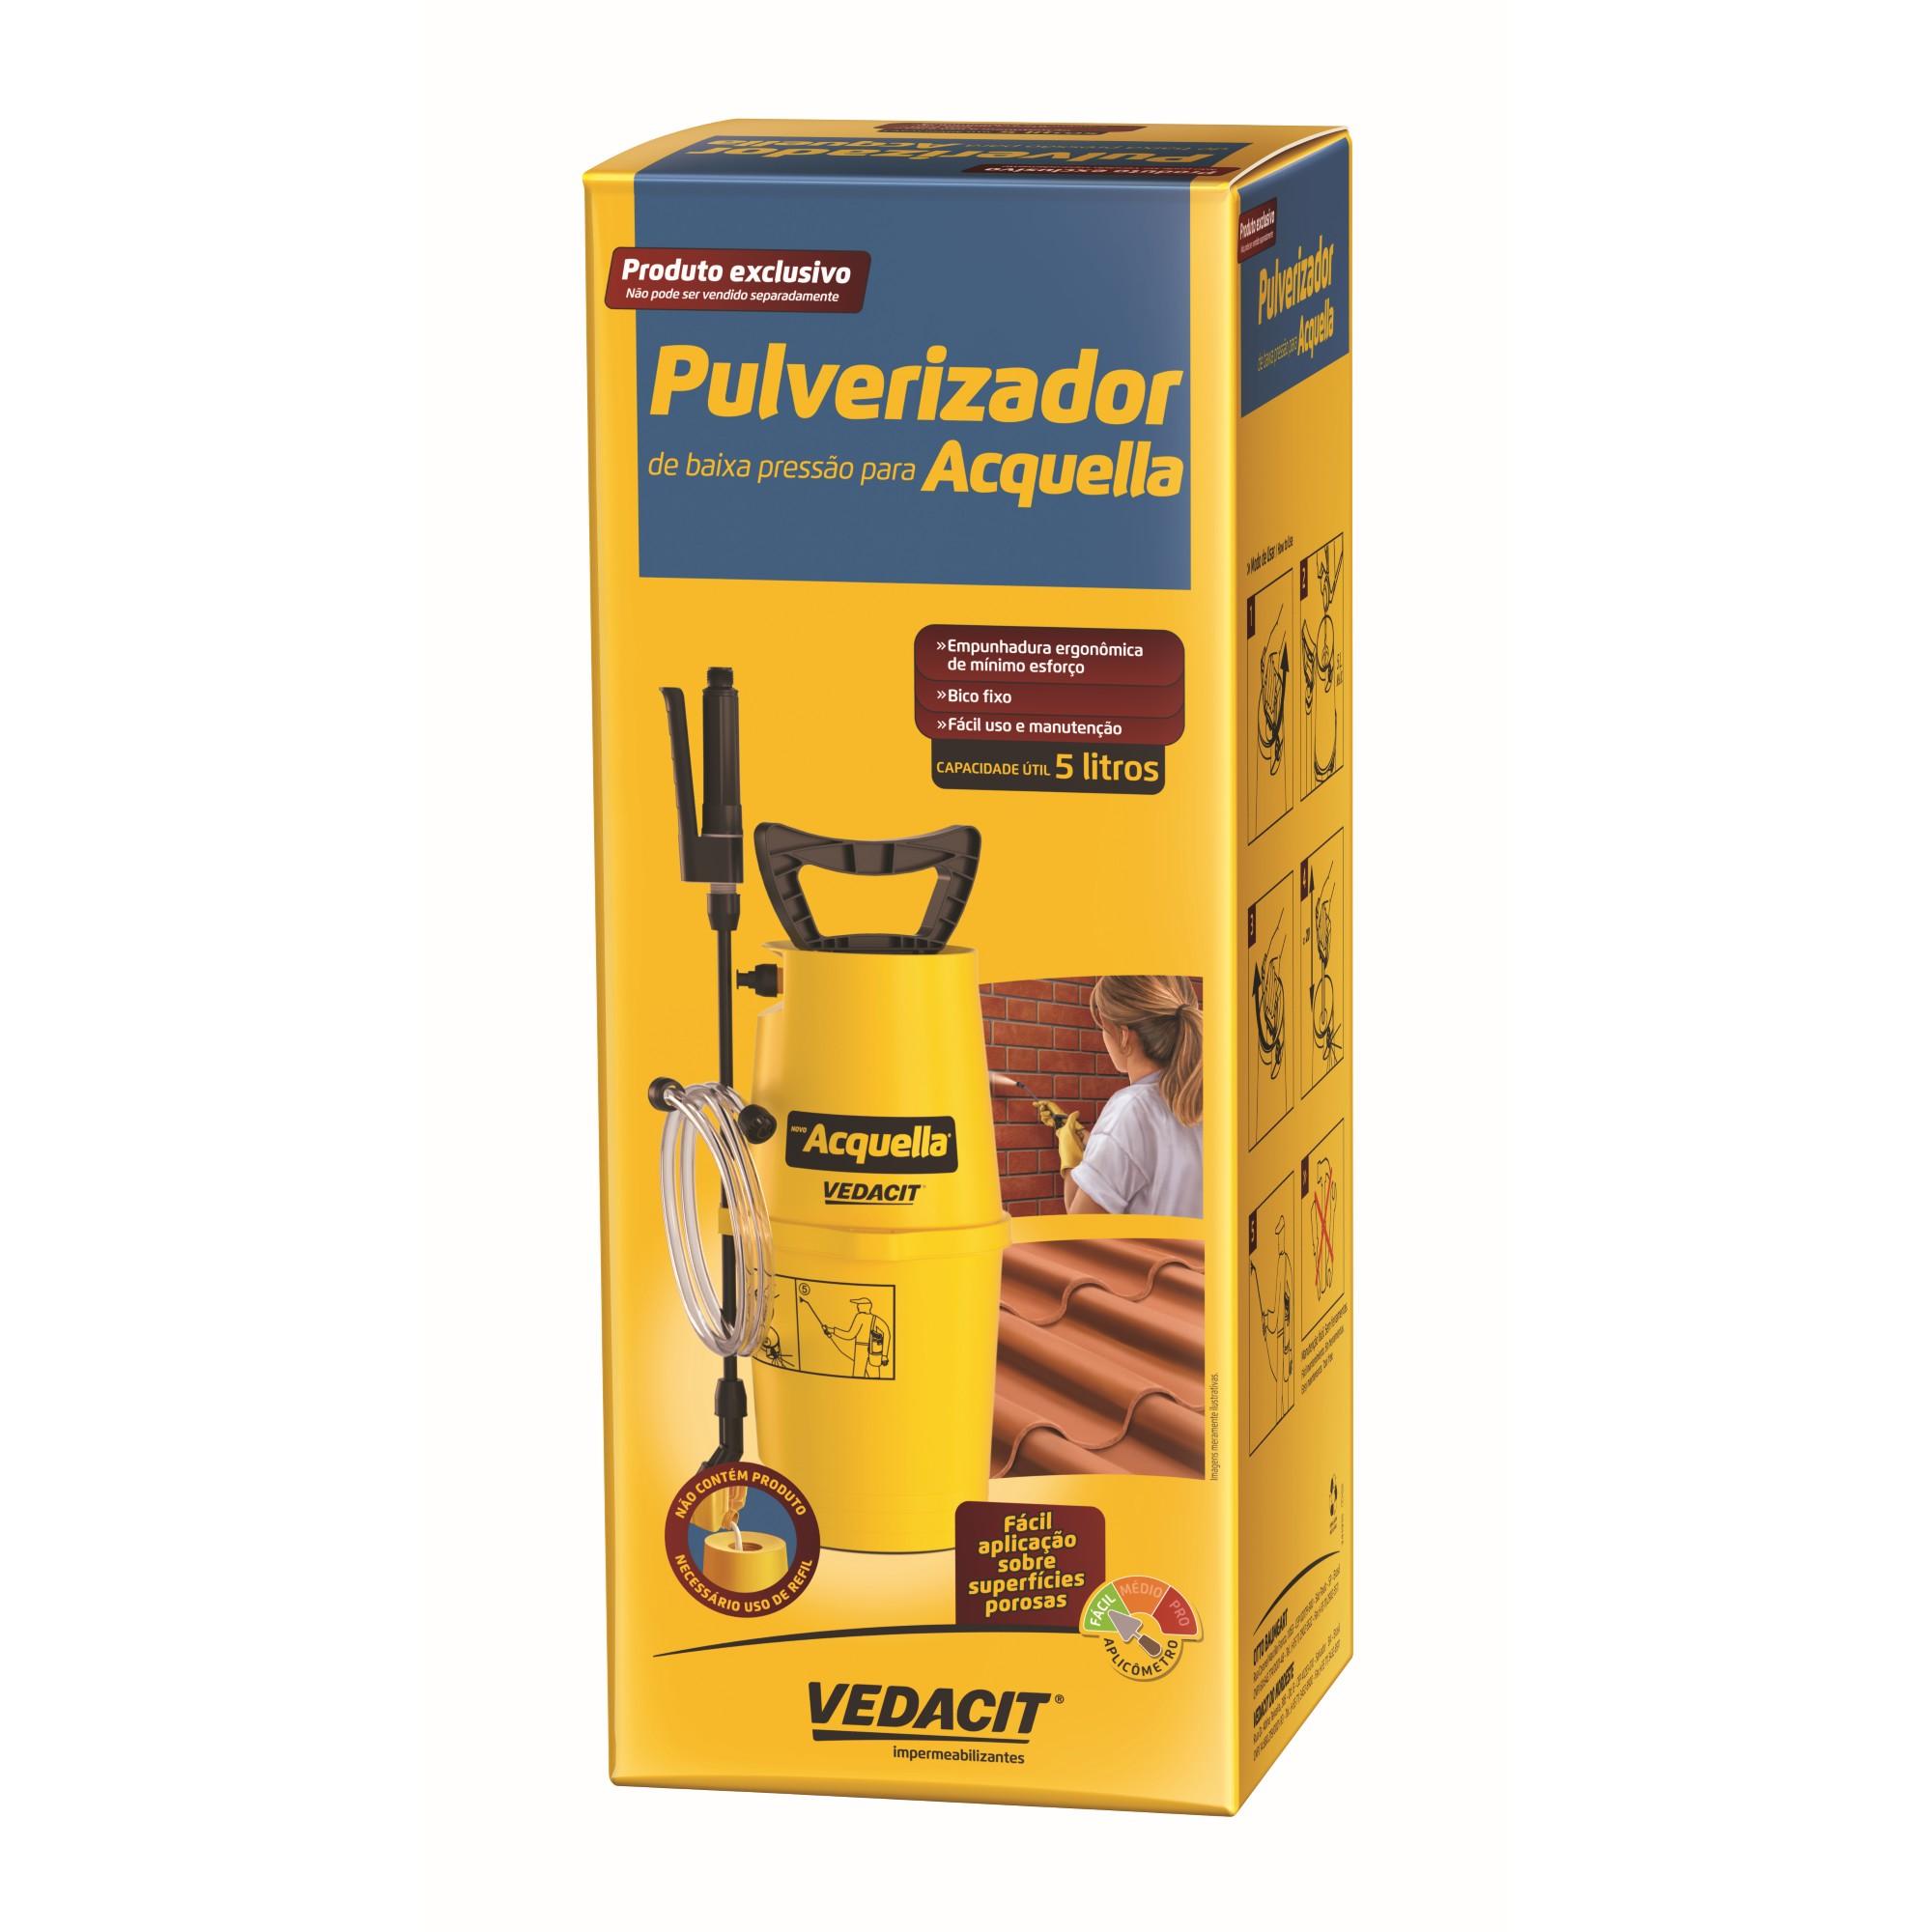 Kit Impermeabilizante para Fachadas Acquella 5L Pulverizador - Vedacit